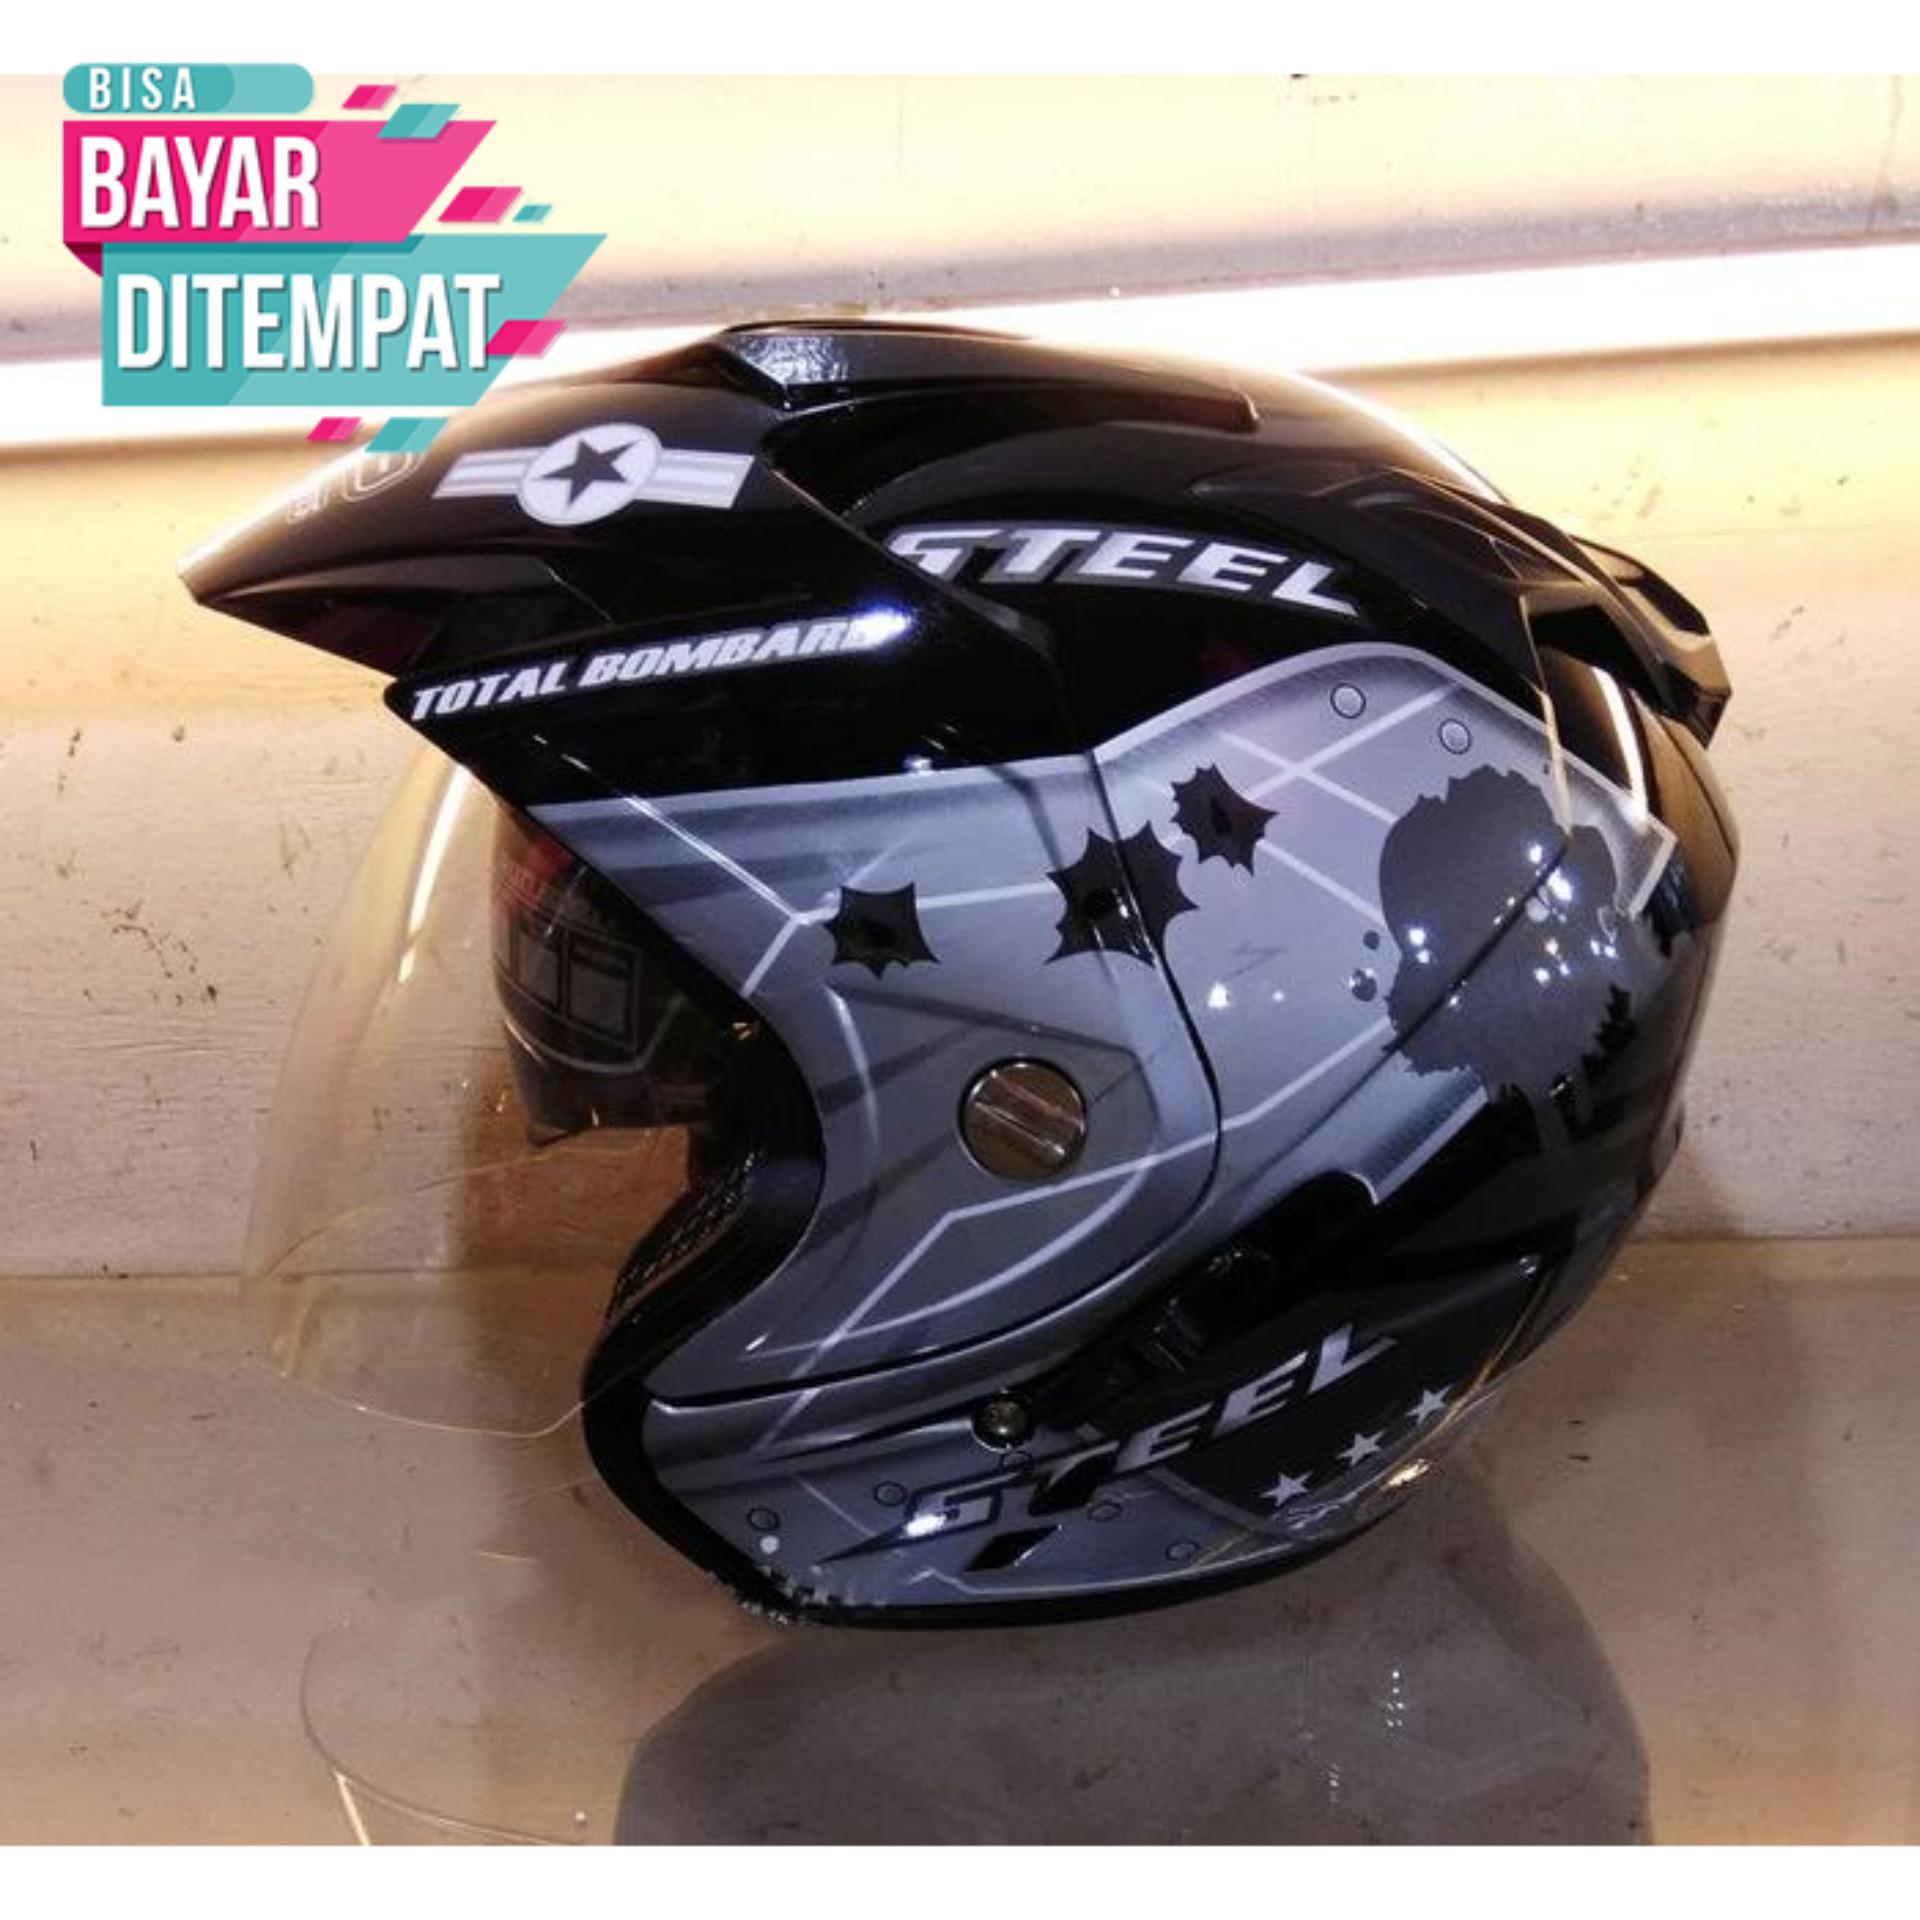 [Promo Best Seller] Helmet Dewasa Double Visor SNI Motoif Air Force Warna Hitam Abu Kualitas Setara Helm KYT INK GM WTO MSR BMC NHK